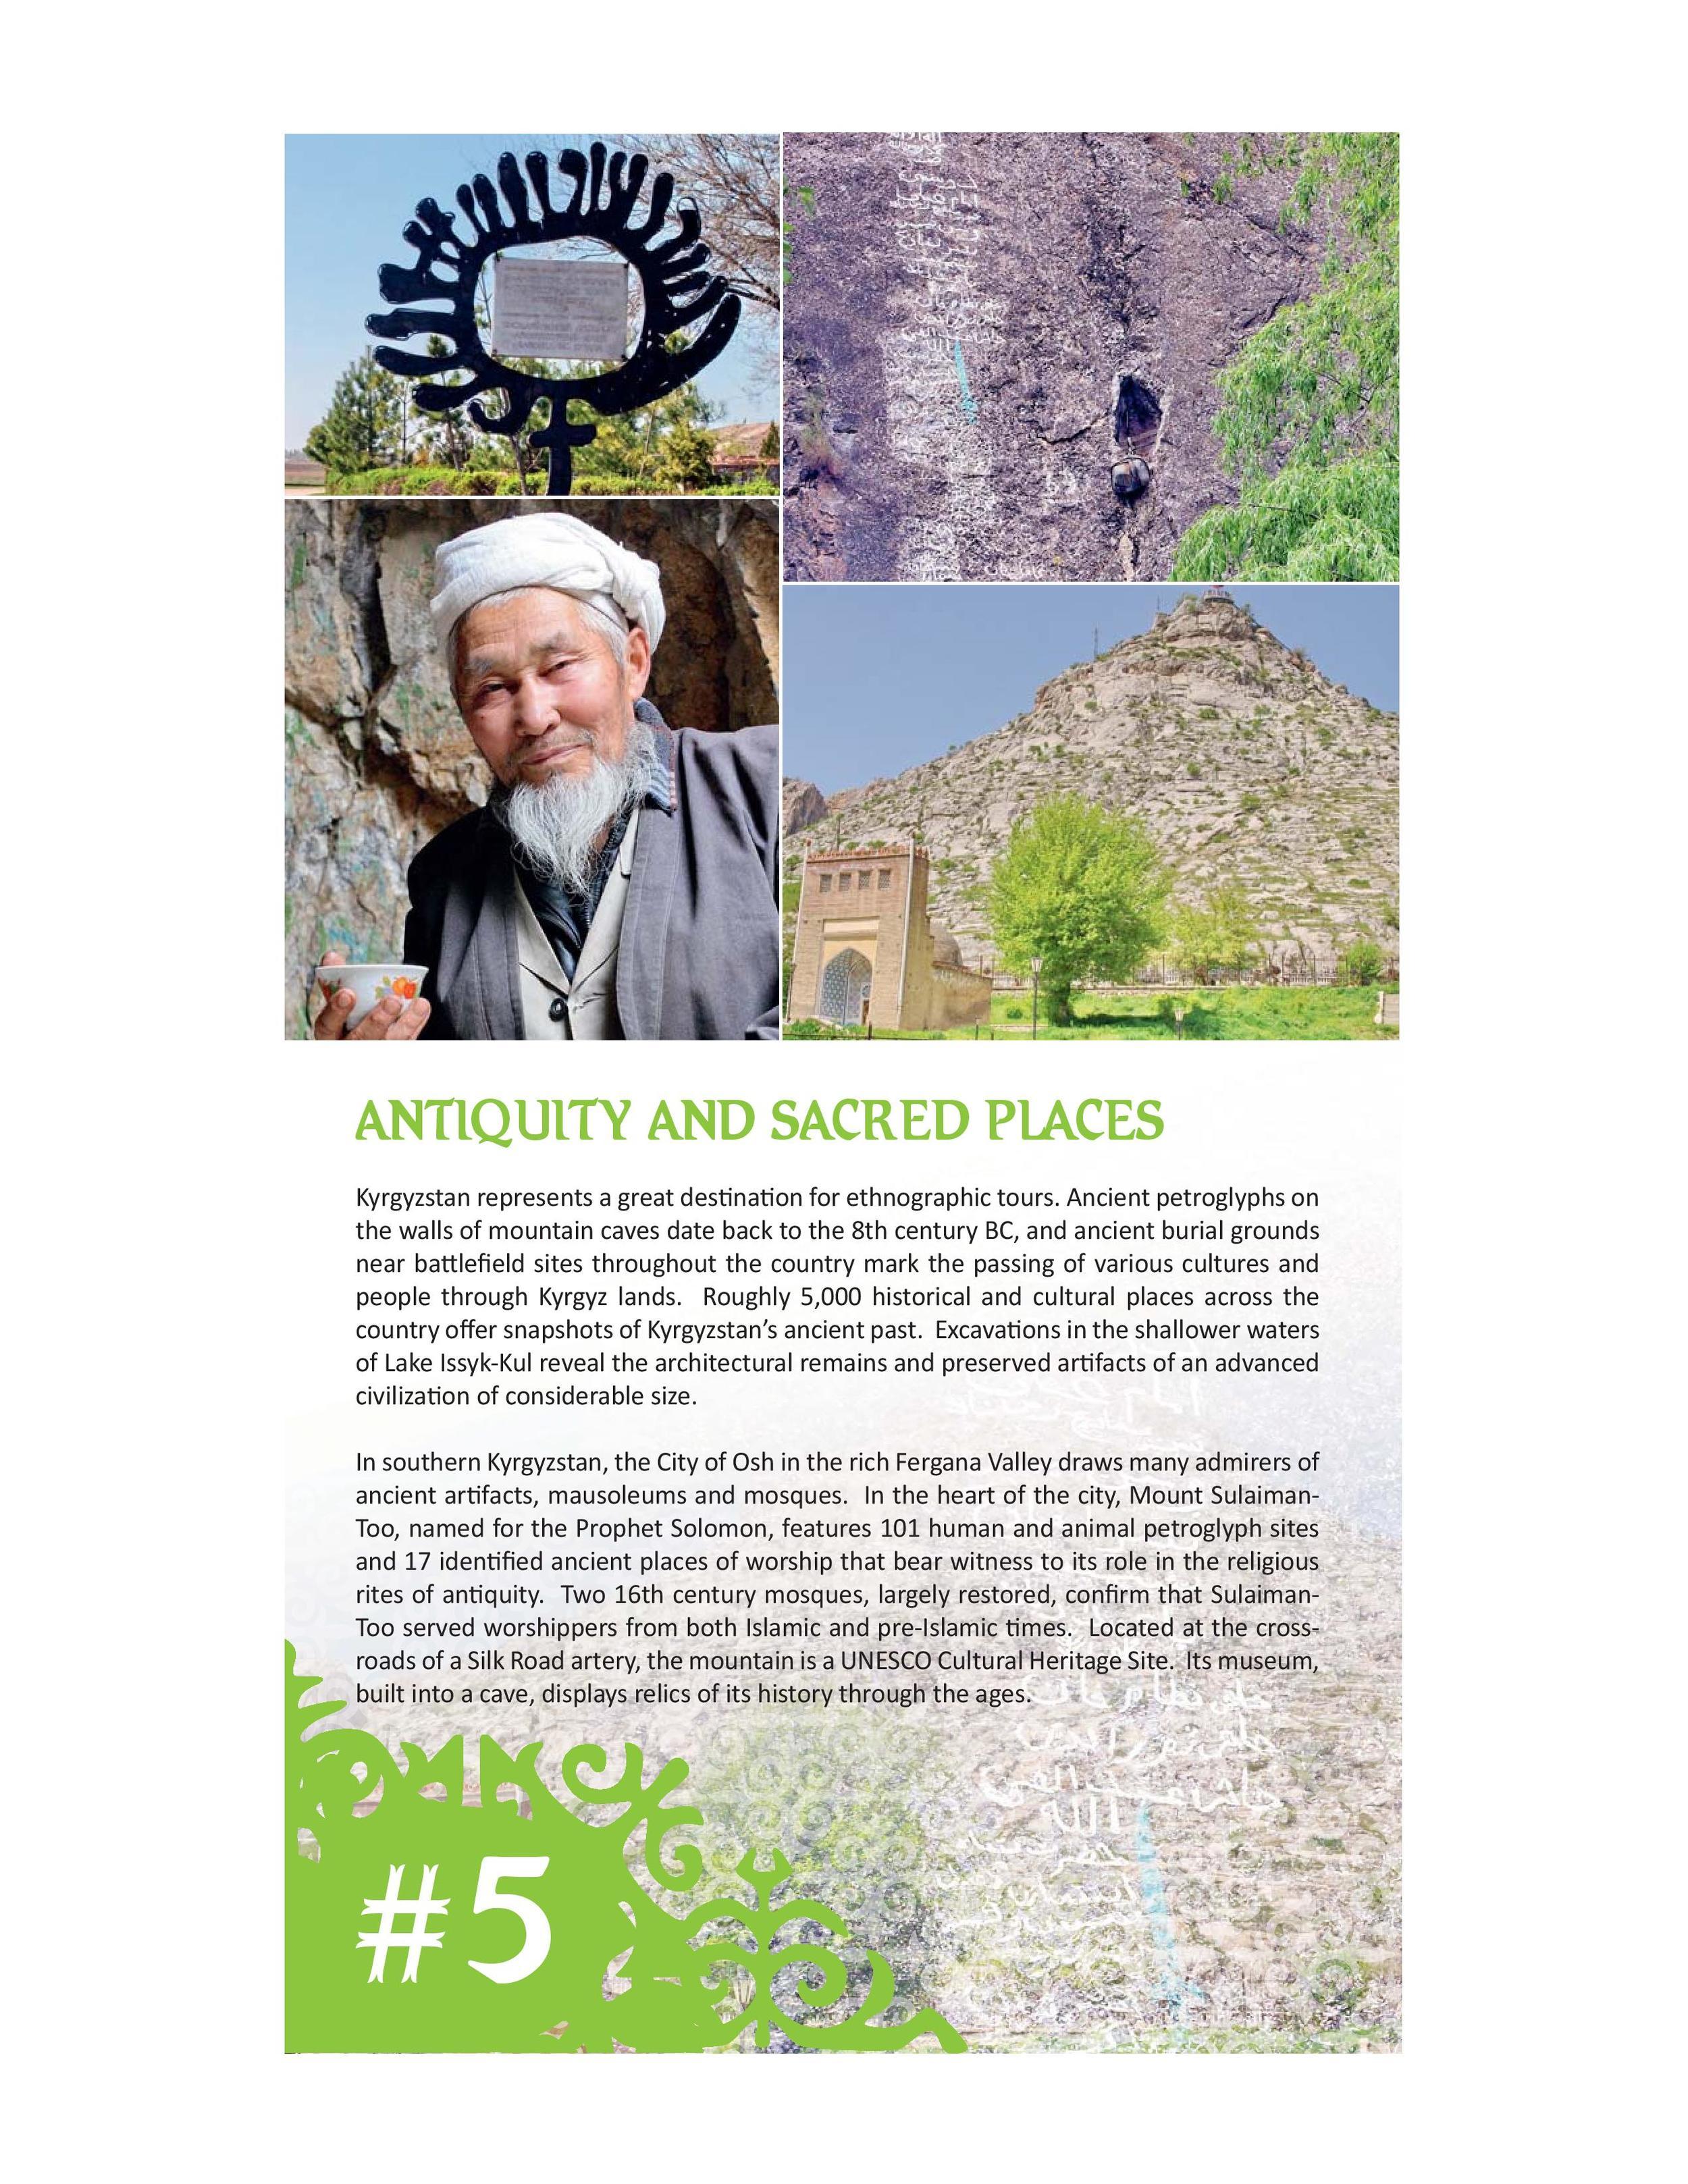 10 reasons to explore Kyrgyzstan_SMALL-page-006.jpg